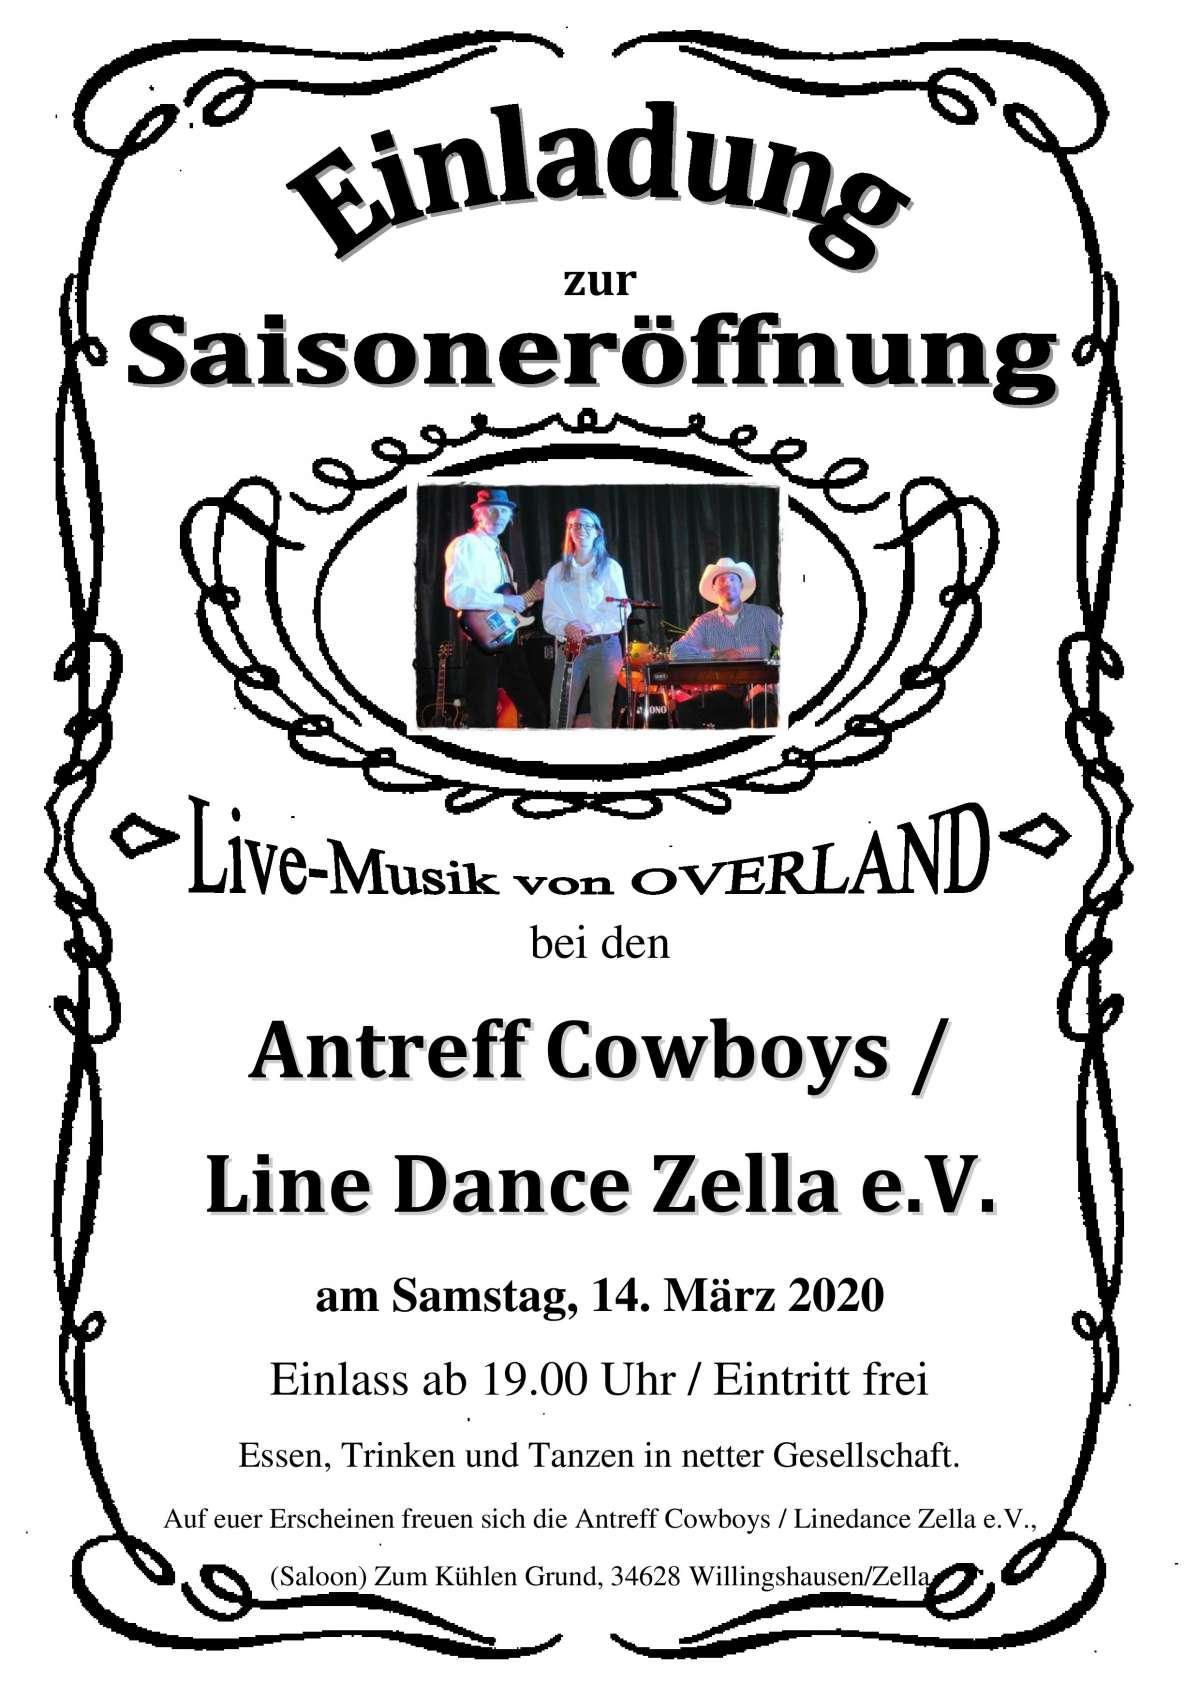 Country Musik - Line Dance - Overland - Saloon der Antreff Cowboys - Willingshausen